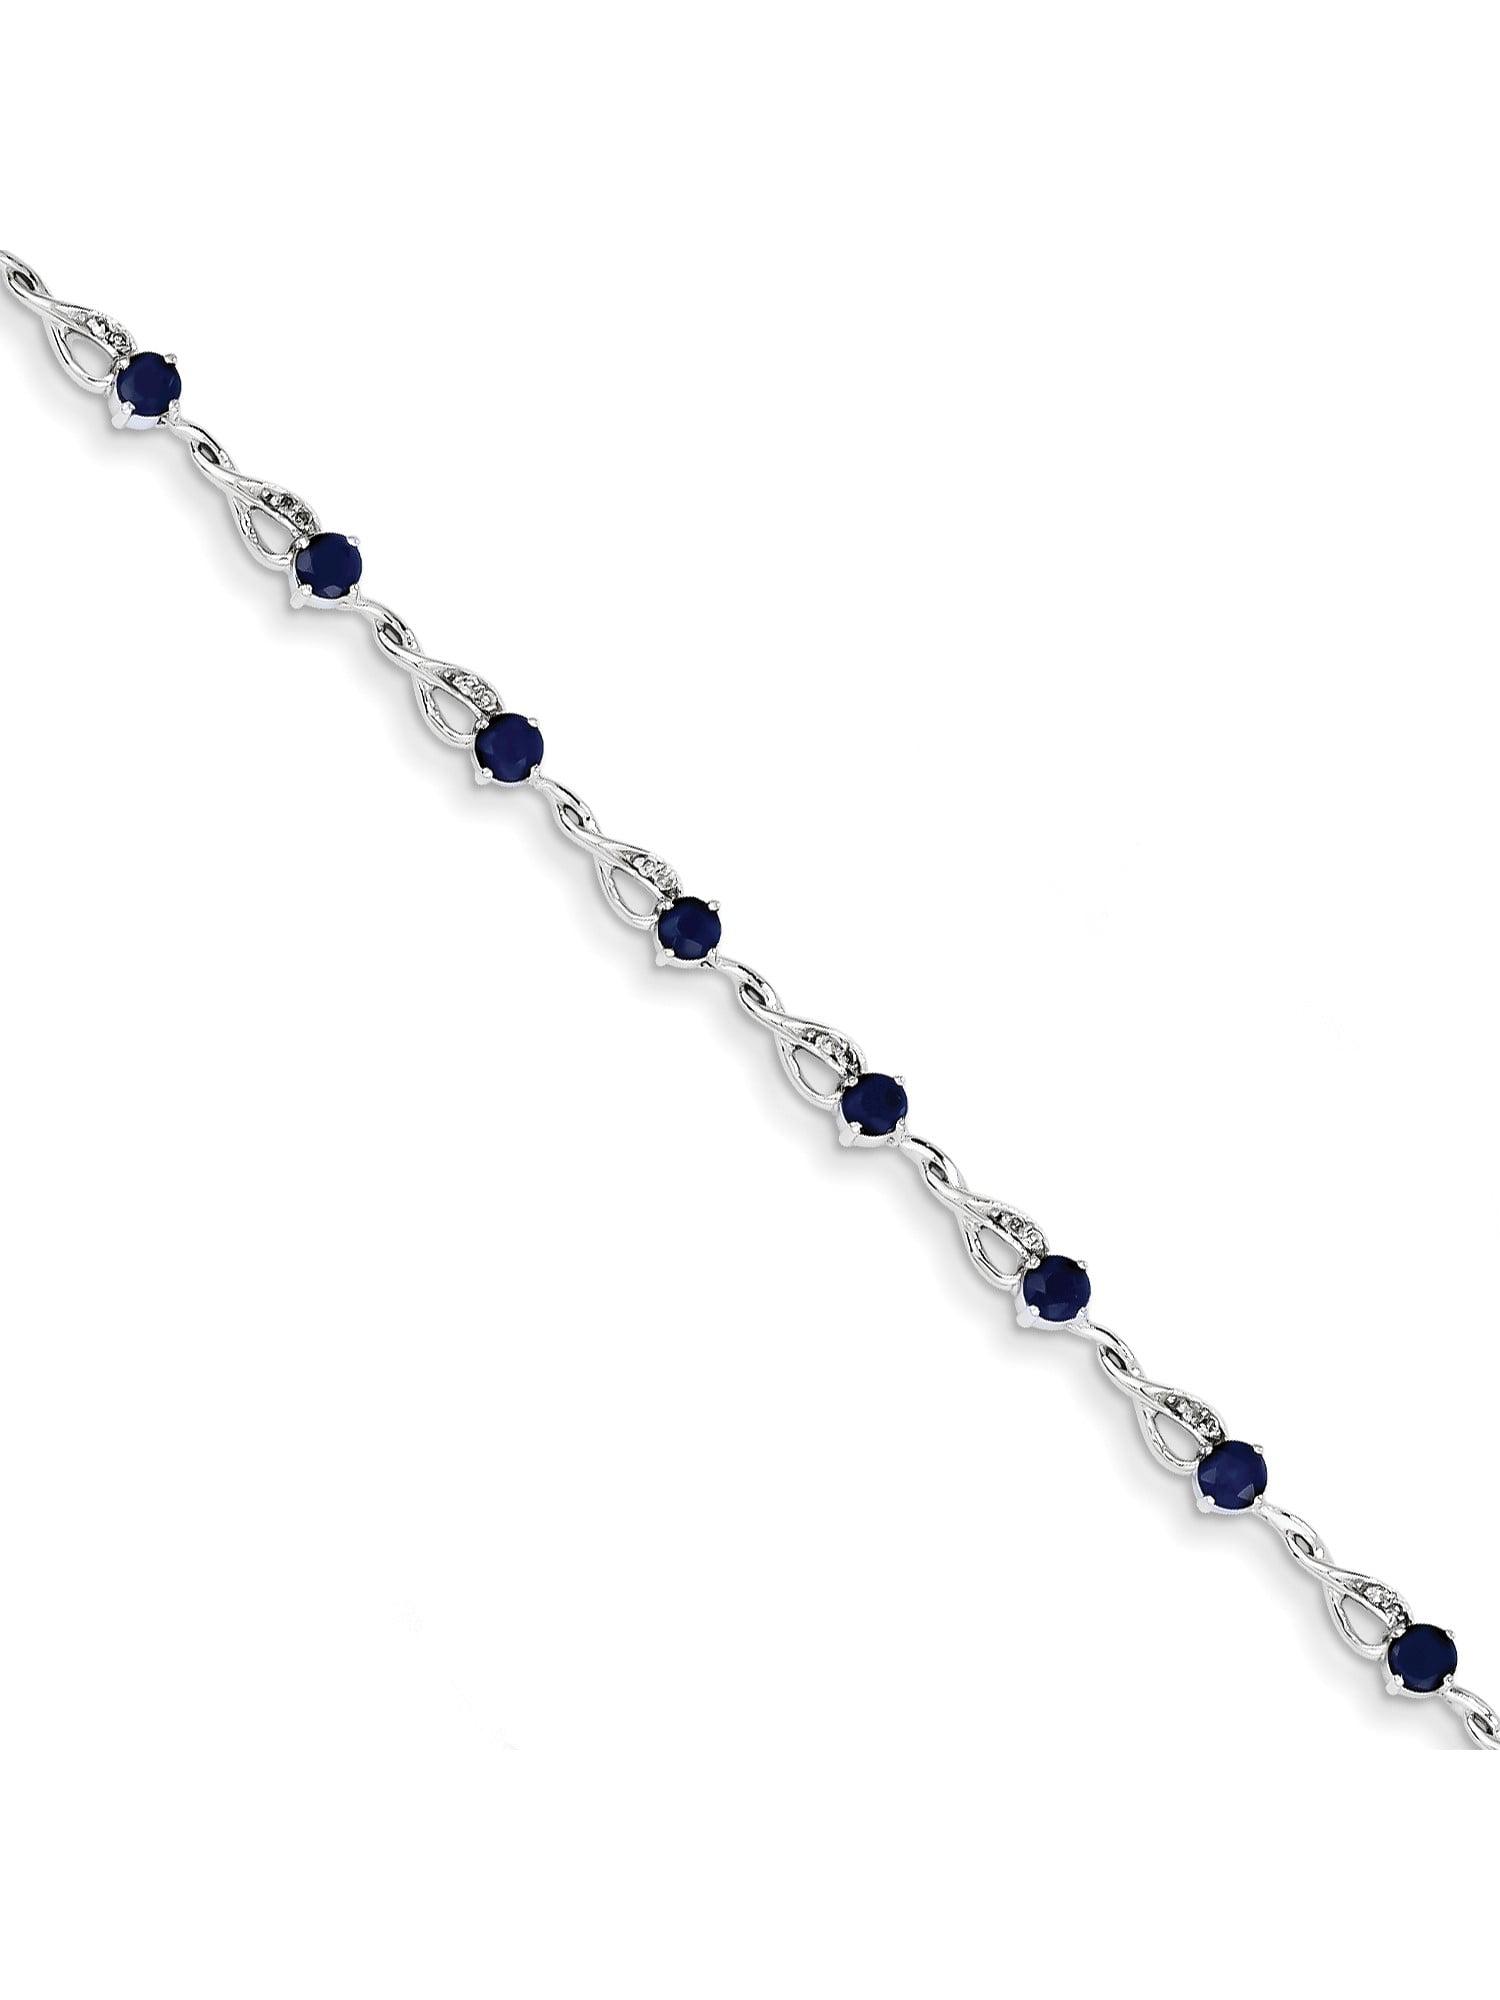 14k White Gold White Diamond and Sapphire Bracelet by